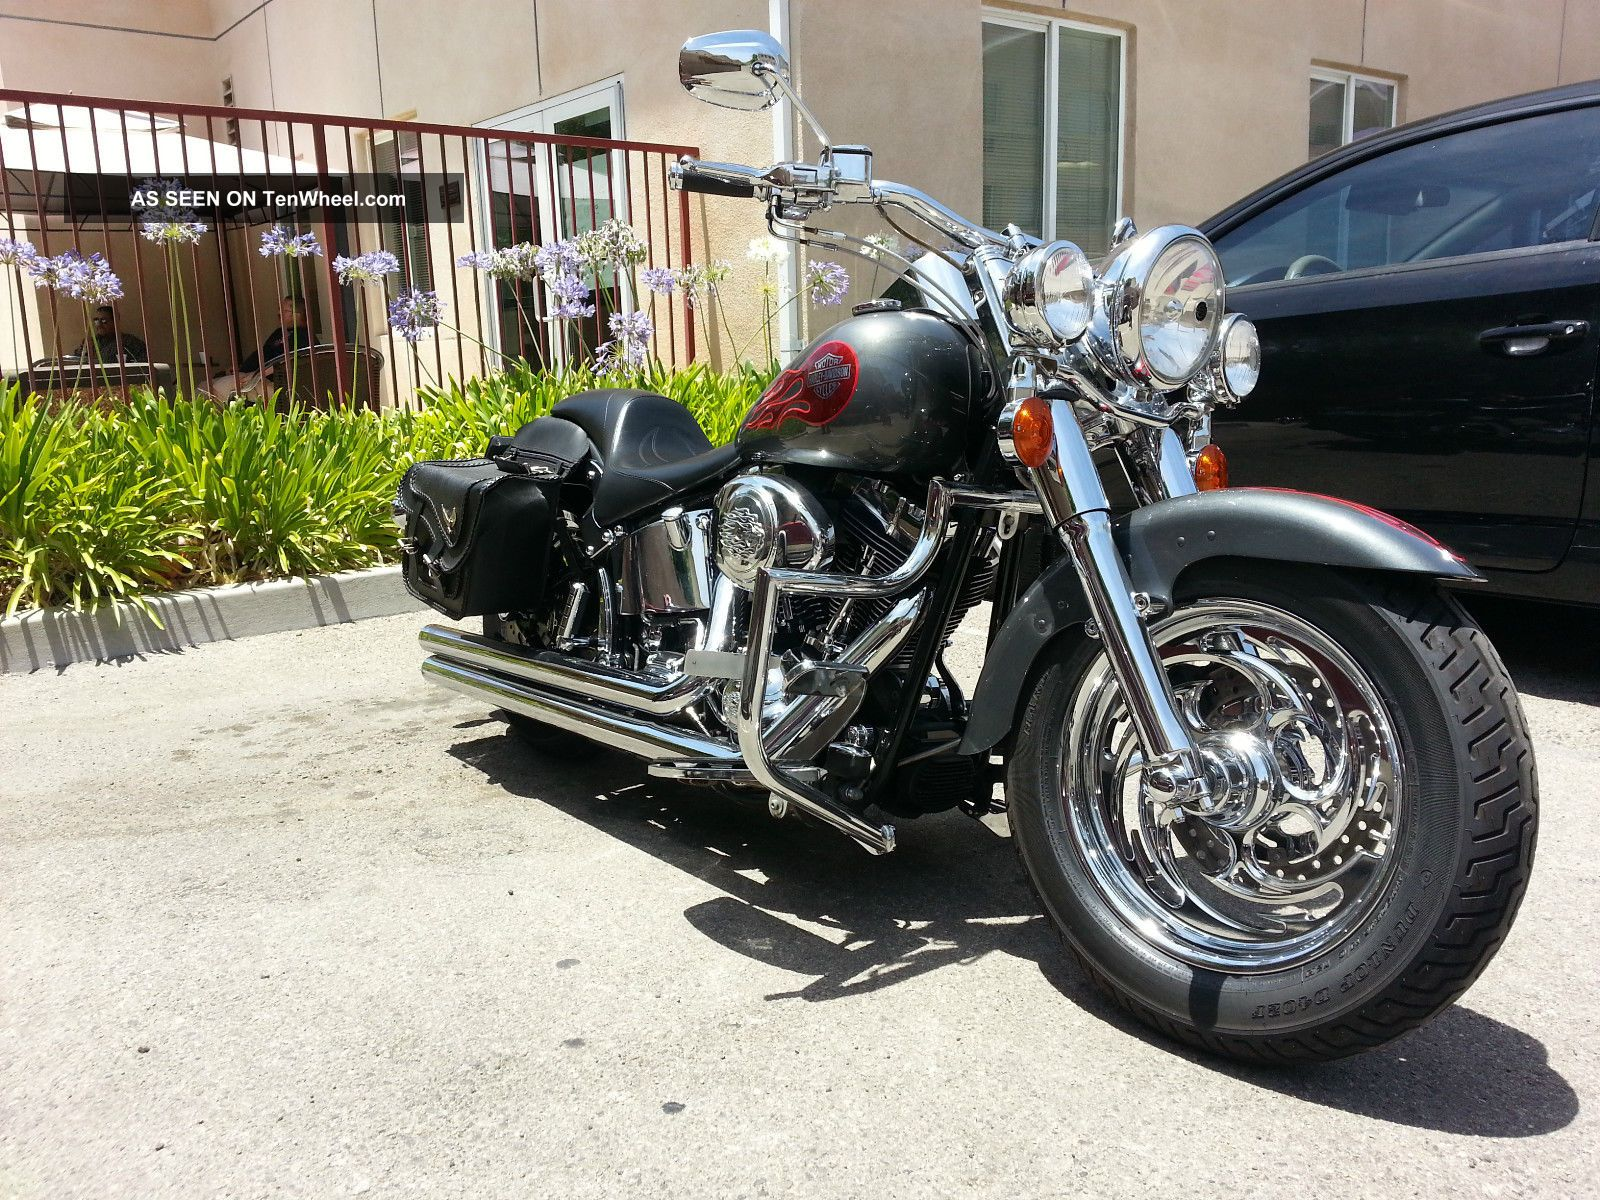 Pics Photos - 2005 Harley Fat Boy Harley Davidson And Chopper ...